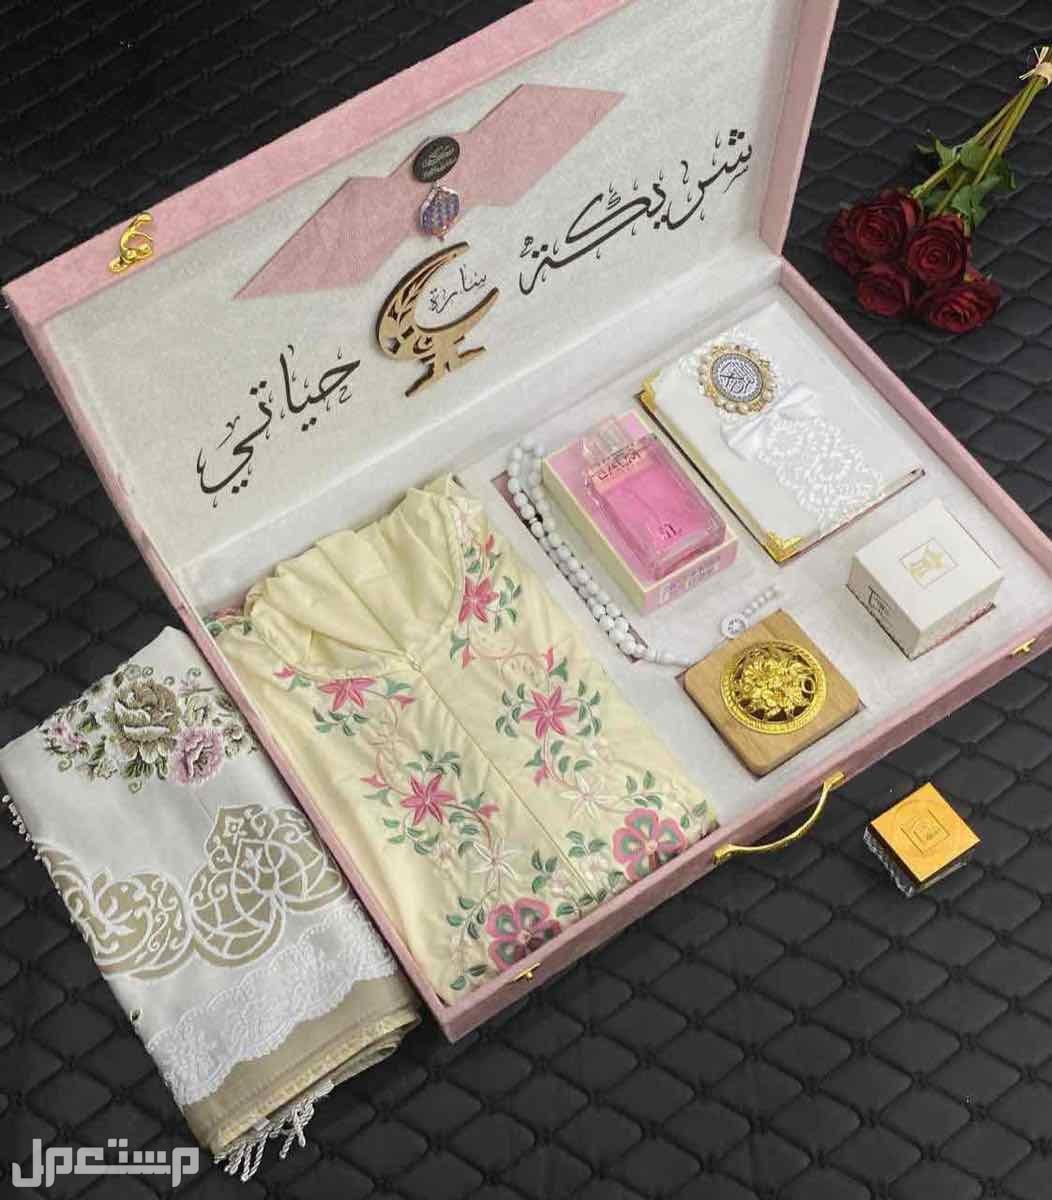 بكسً هدايا رمضاني نسائي شنطه جلابيه سجاده ثوب صلاه المصحف الشريف مبخره